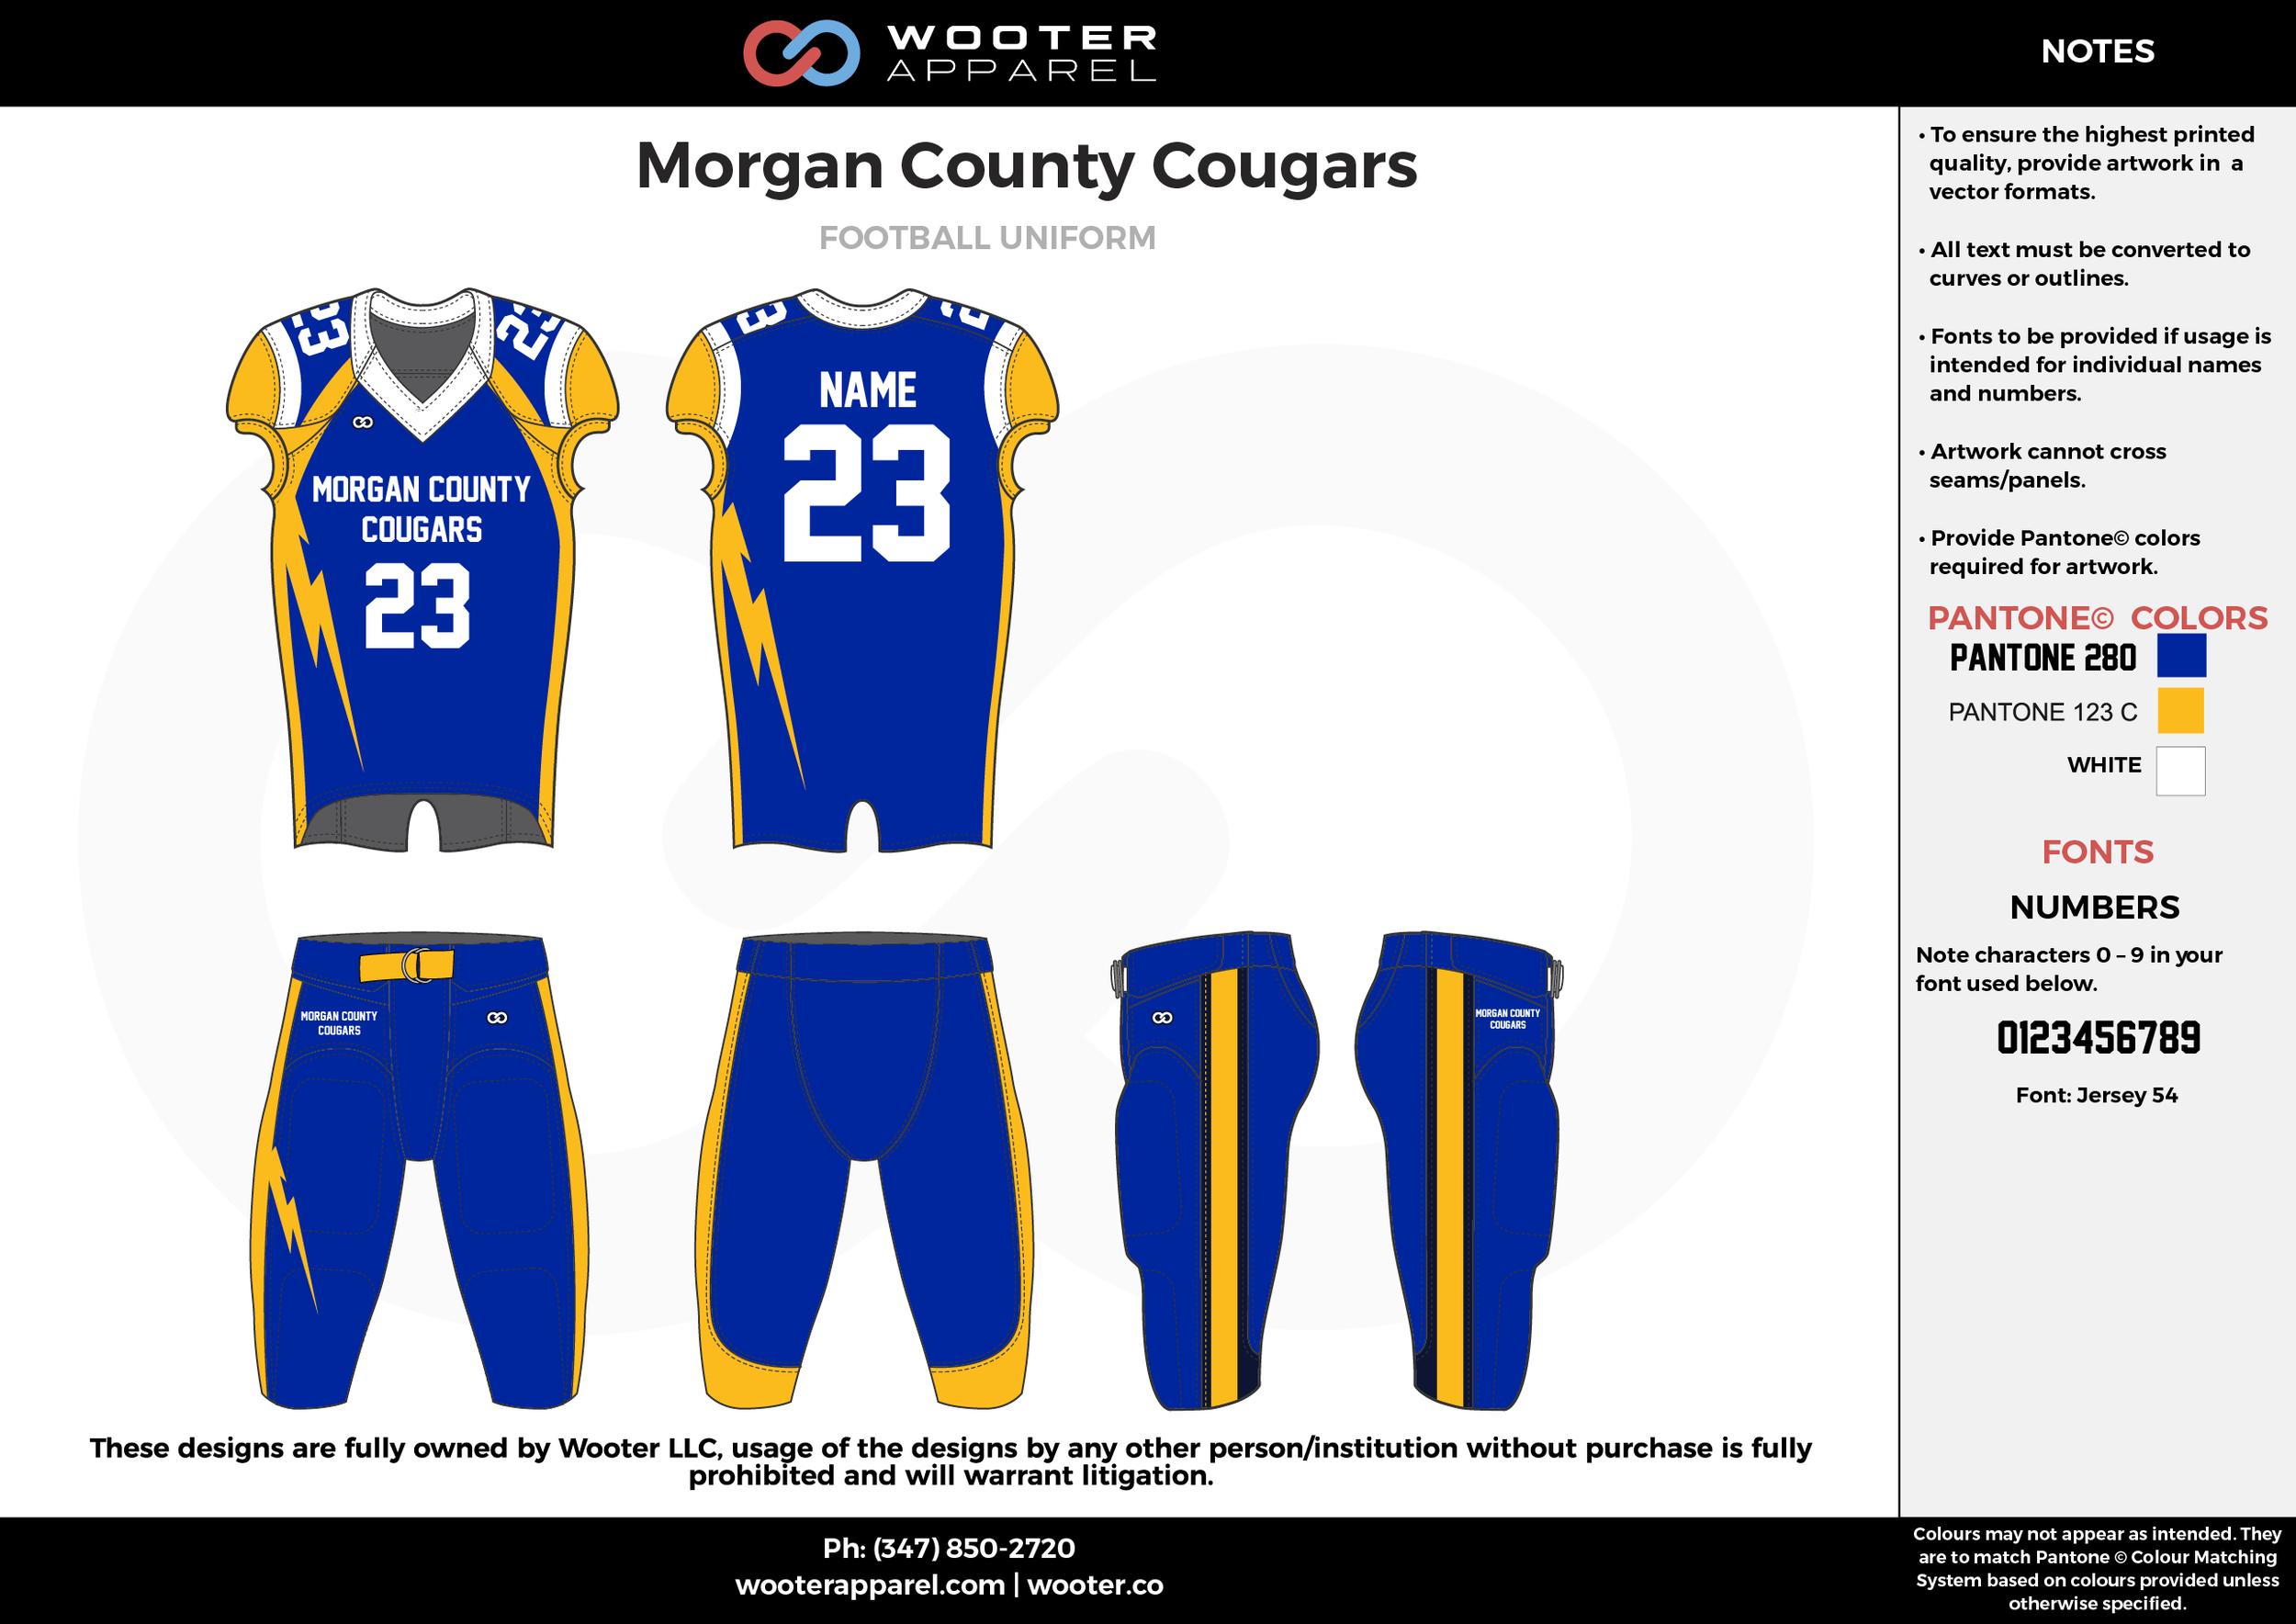 Morgan County Cougars blue yellow white football uniforms jerseys pants